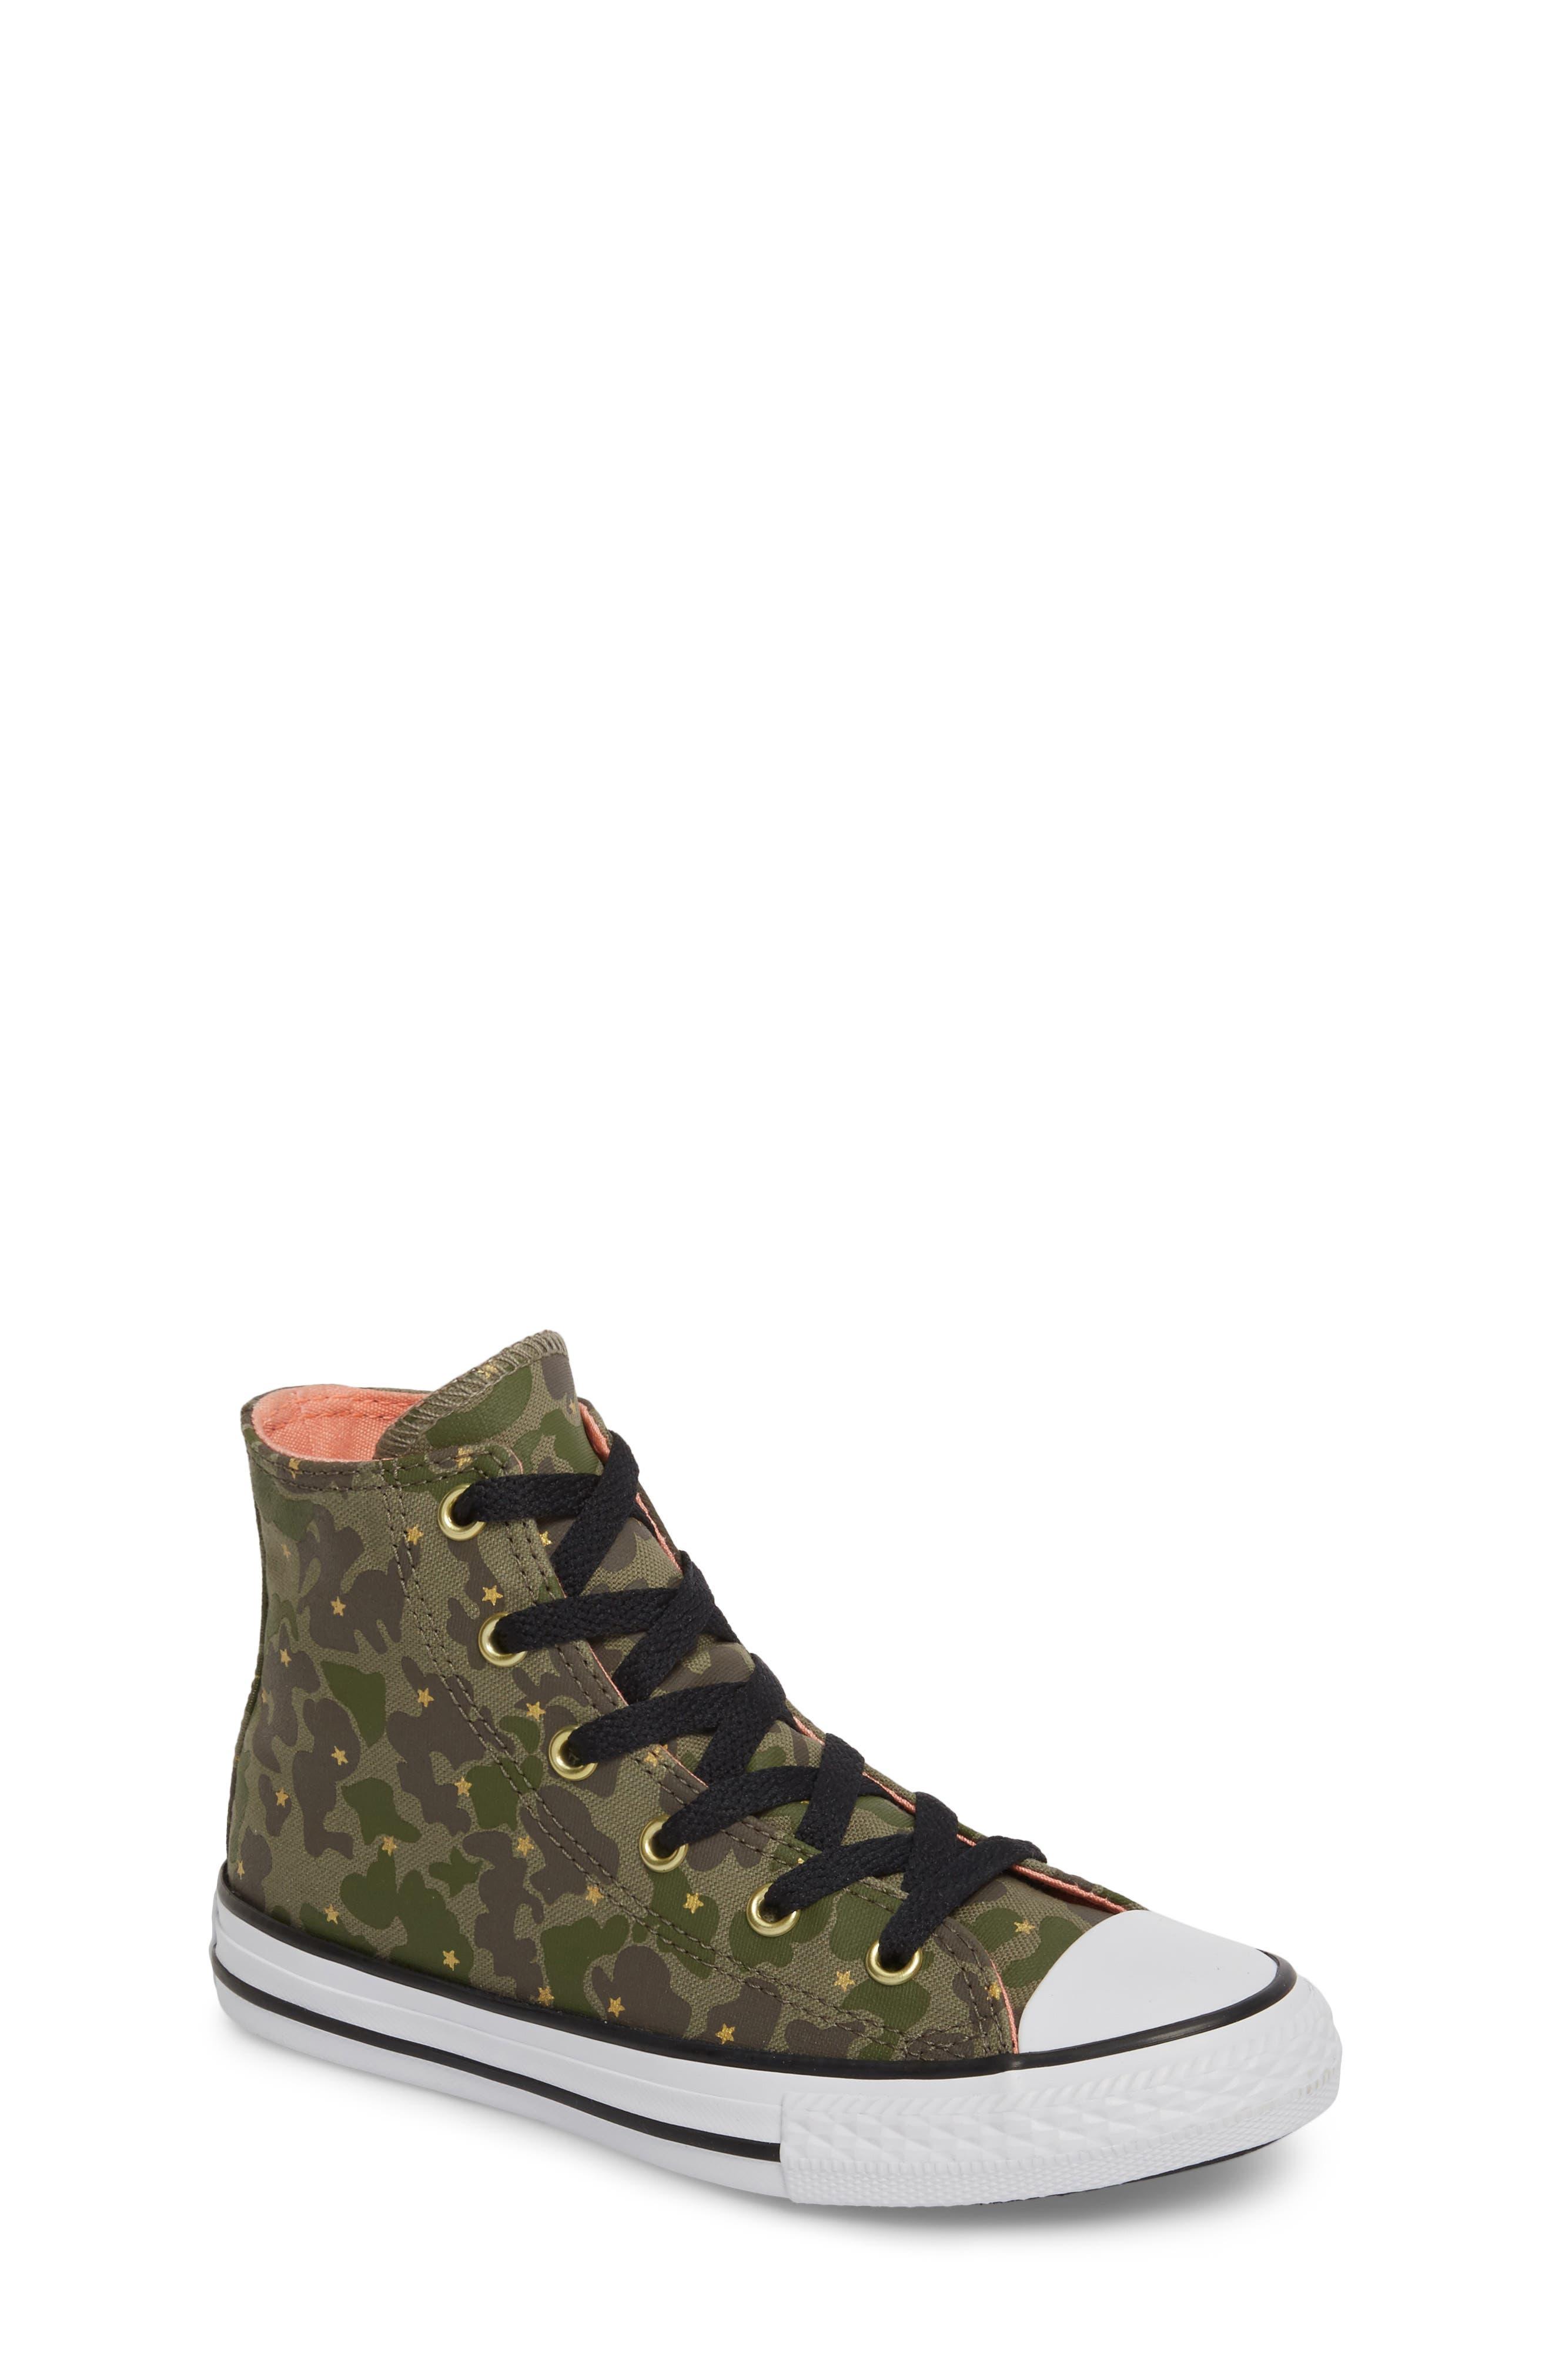 Camo High Top Sneaker,                         Main,                         color, Surplus